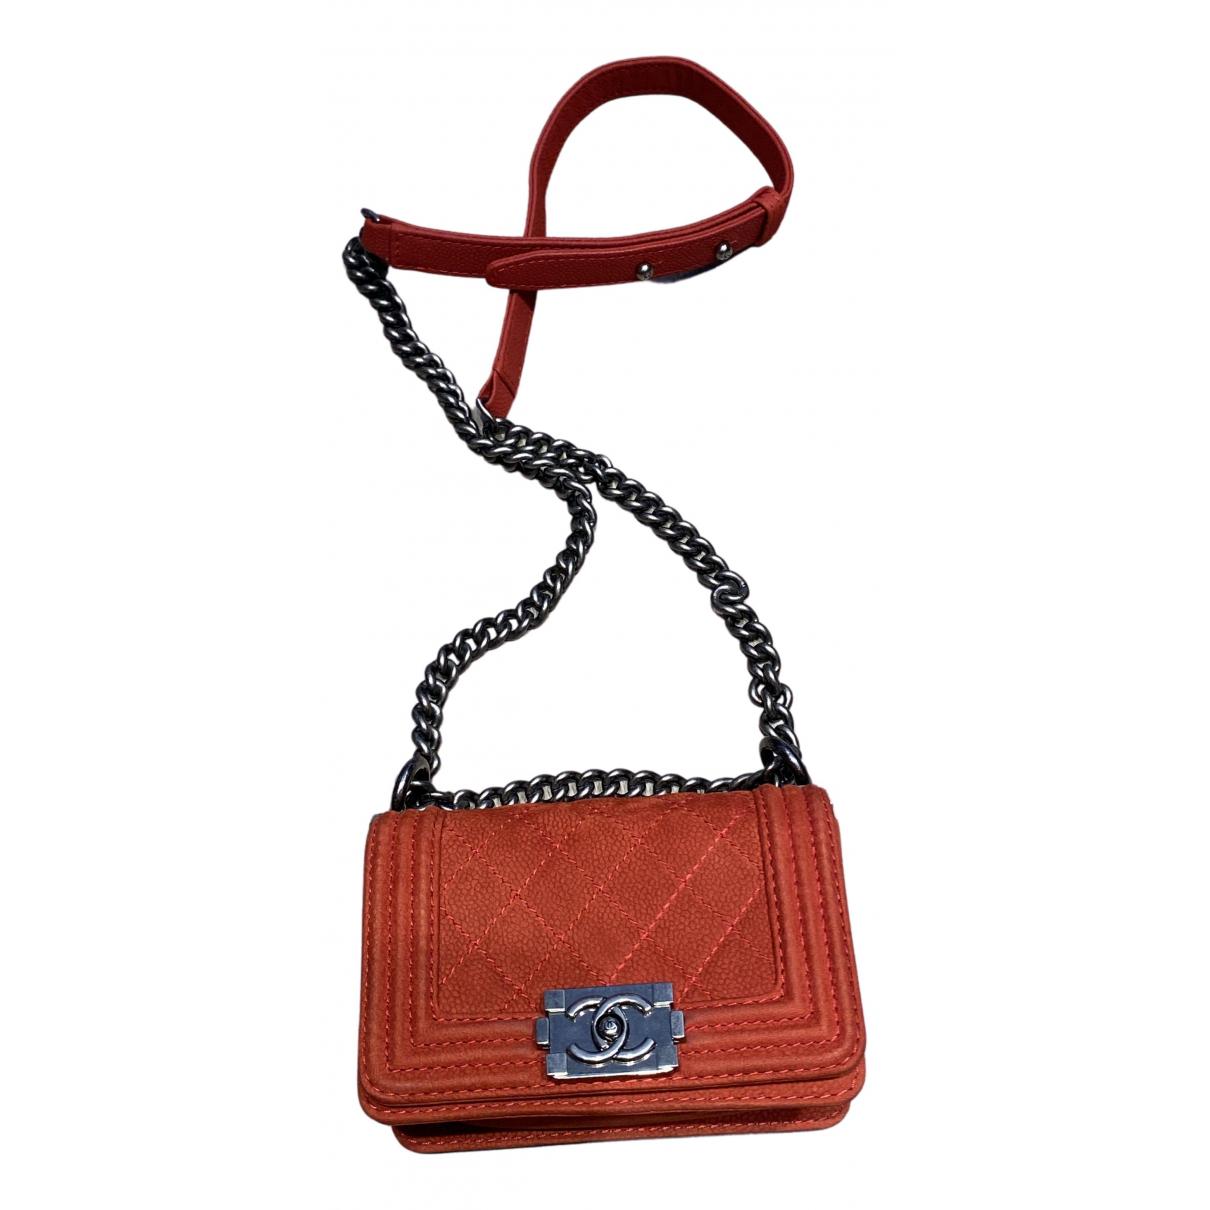 Chanel Boy Red Leather handbag for Women N